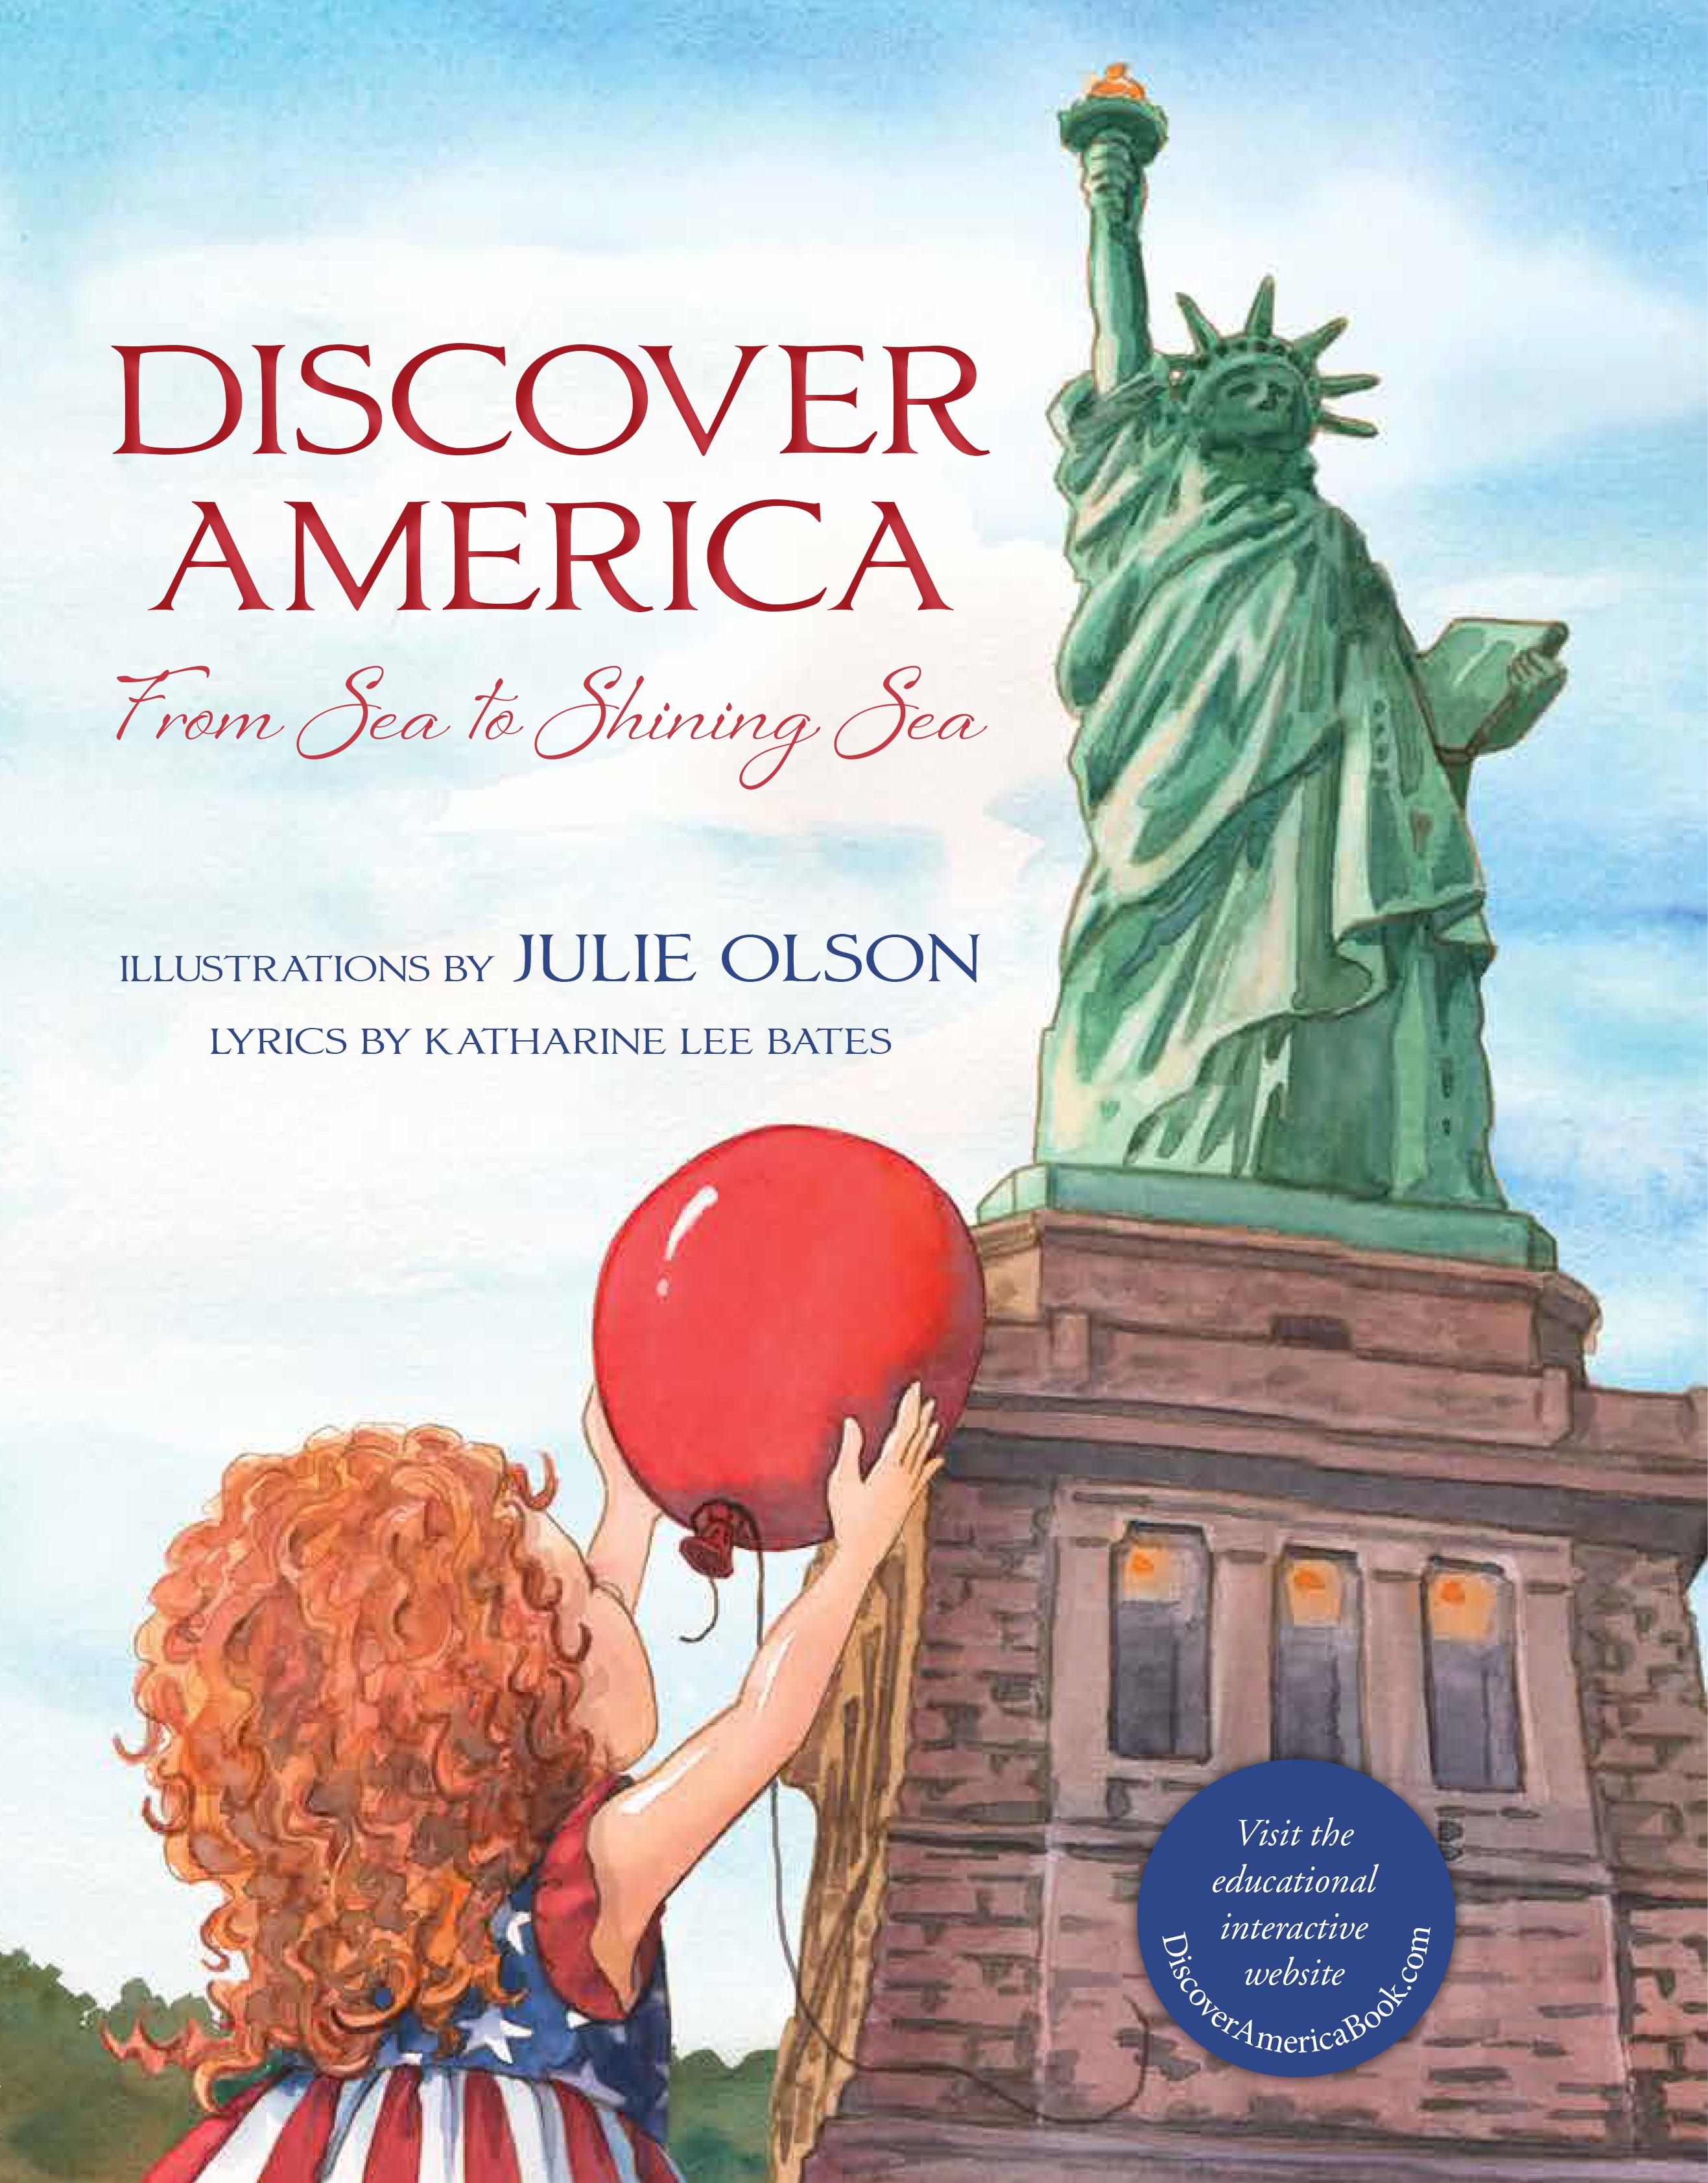 Discover America covert